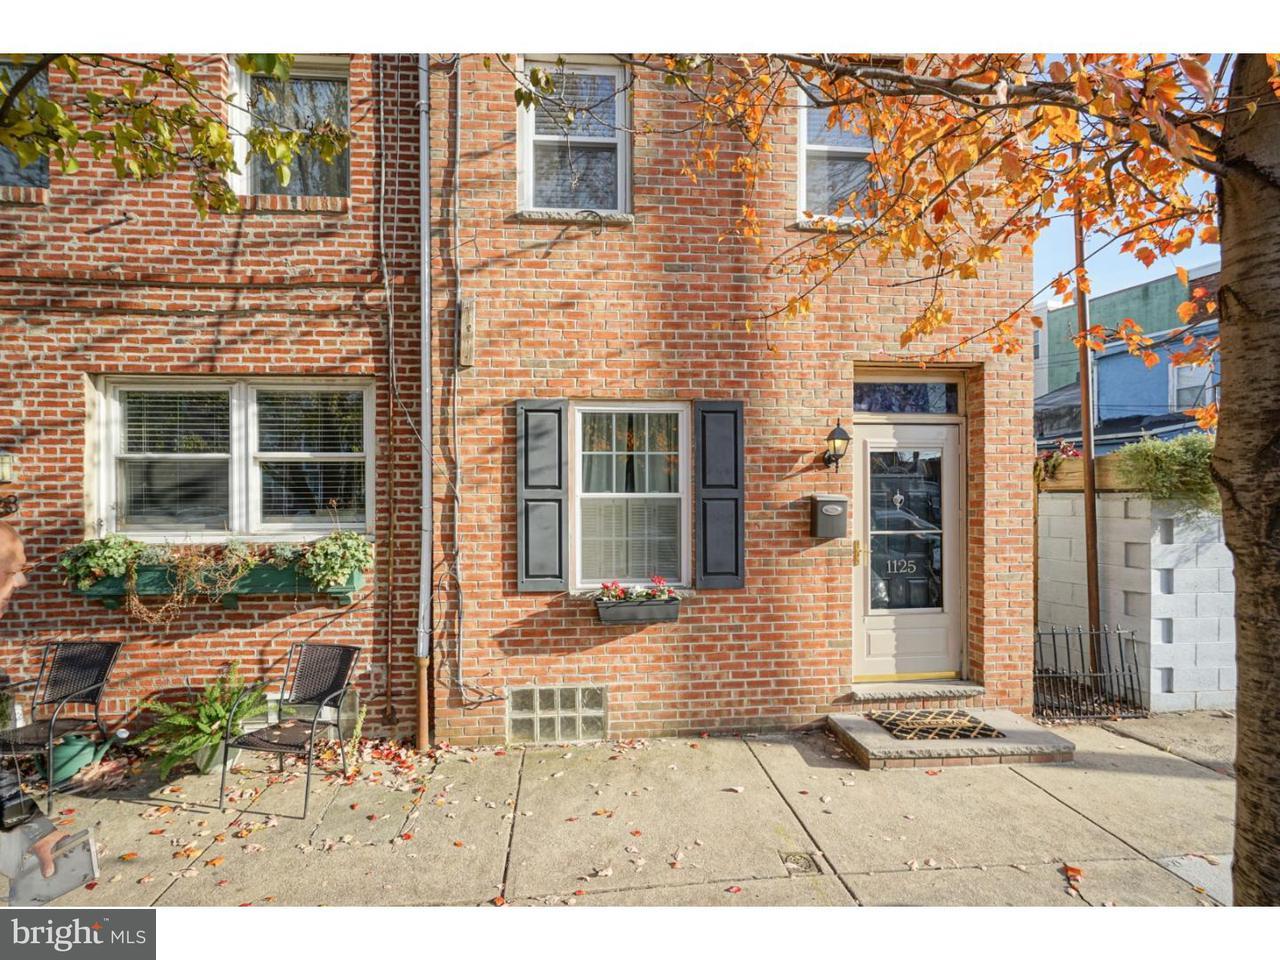 1125 E Moyamensing Philadelphia, PA 19147